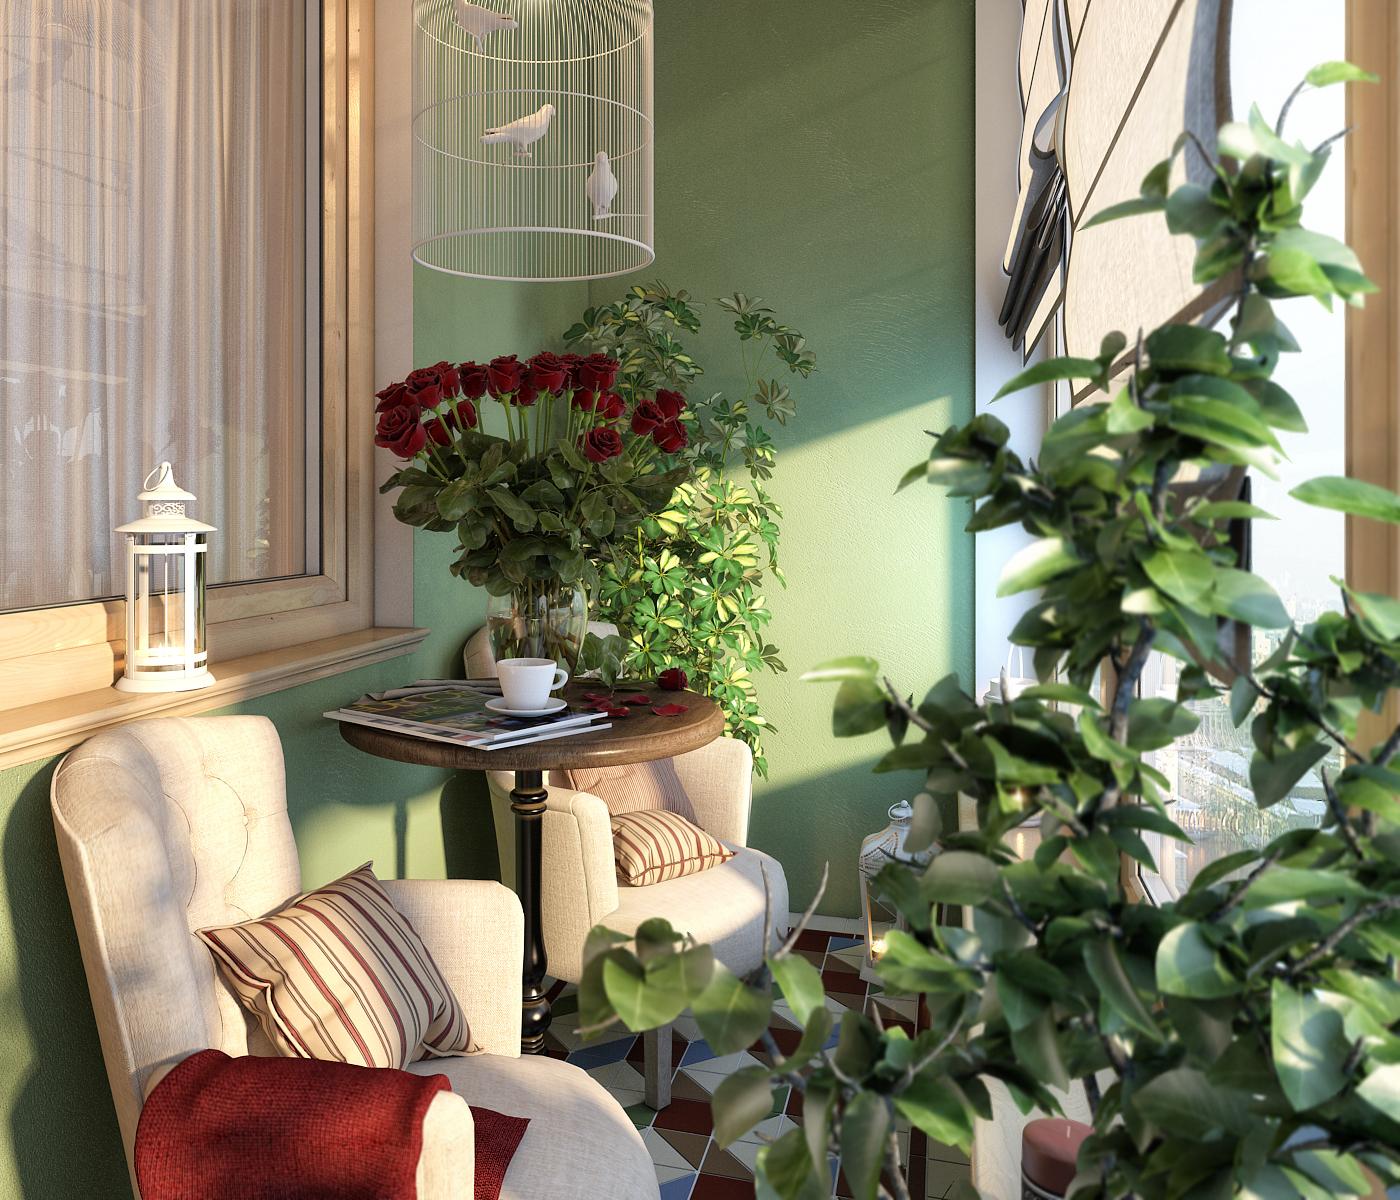 dizayn balkona 24 - Идеи для оформления балкона